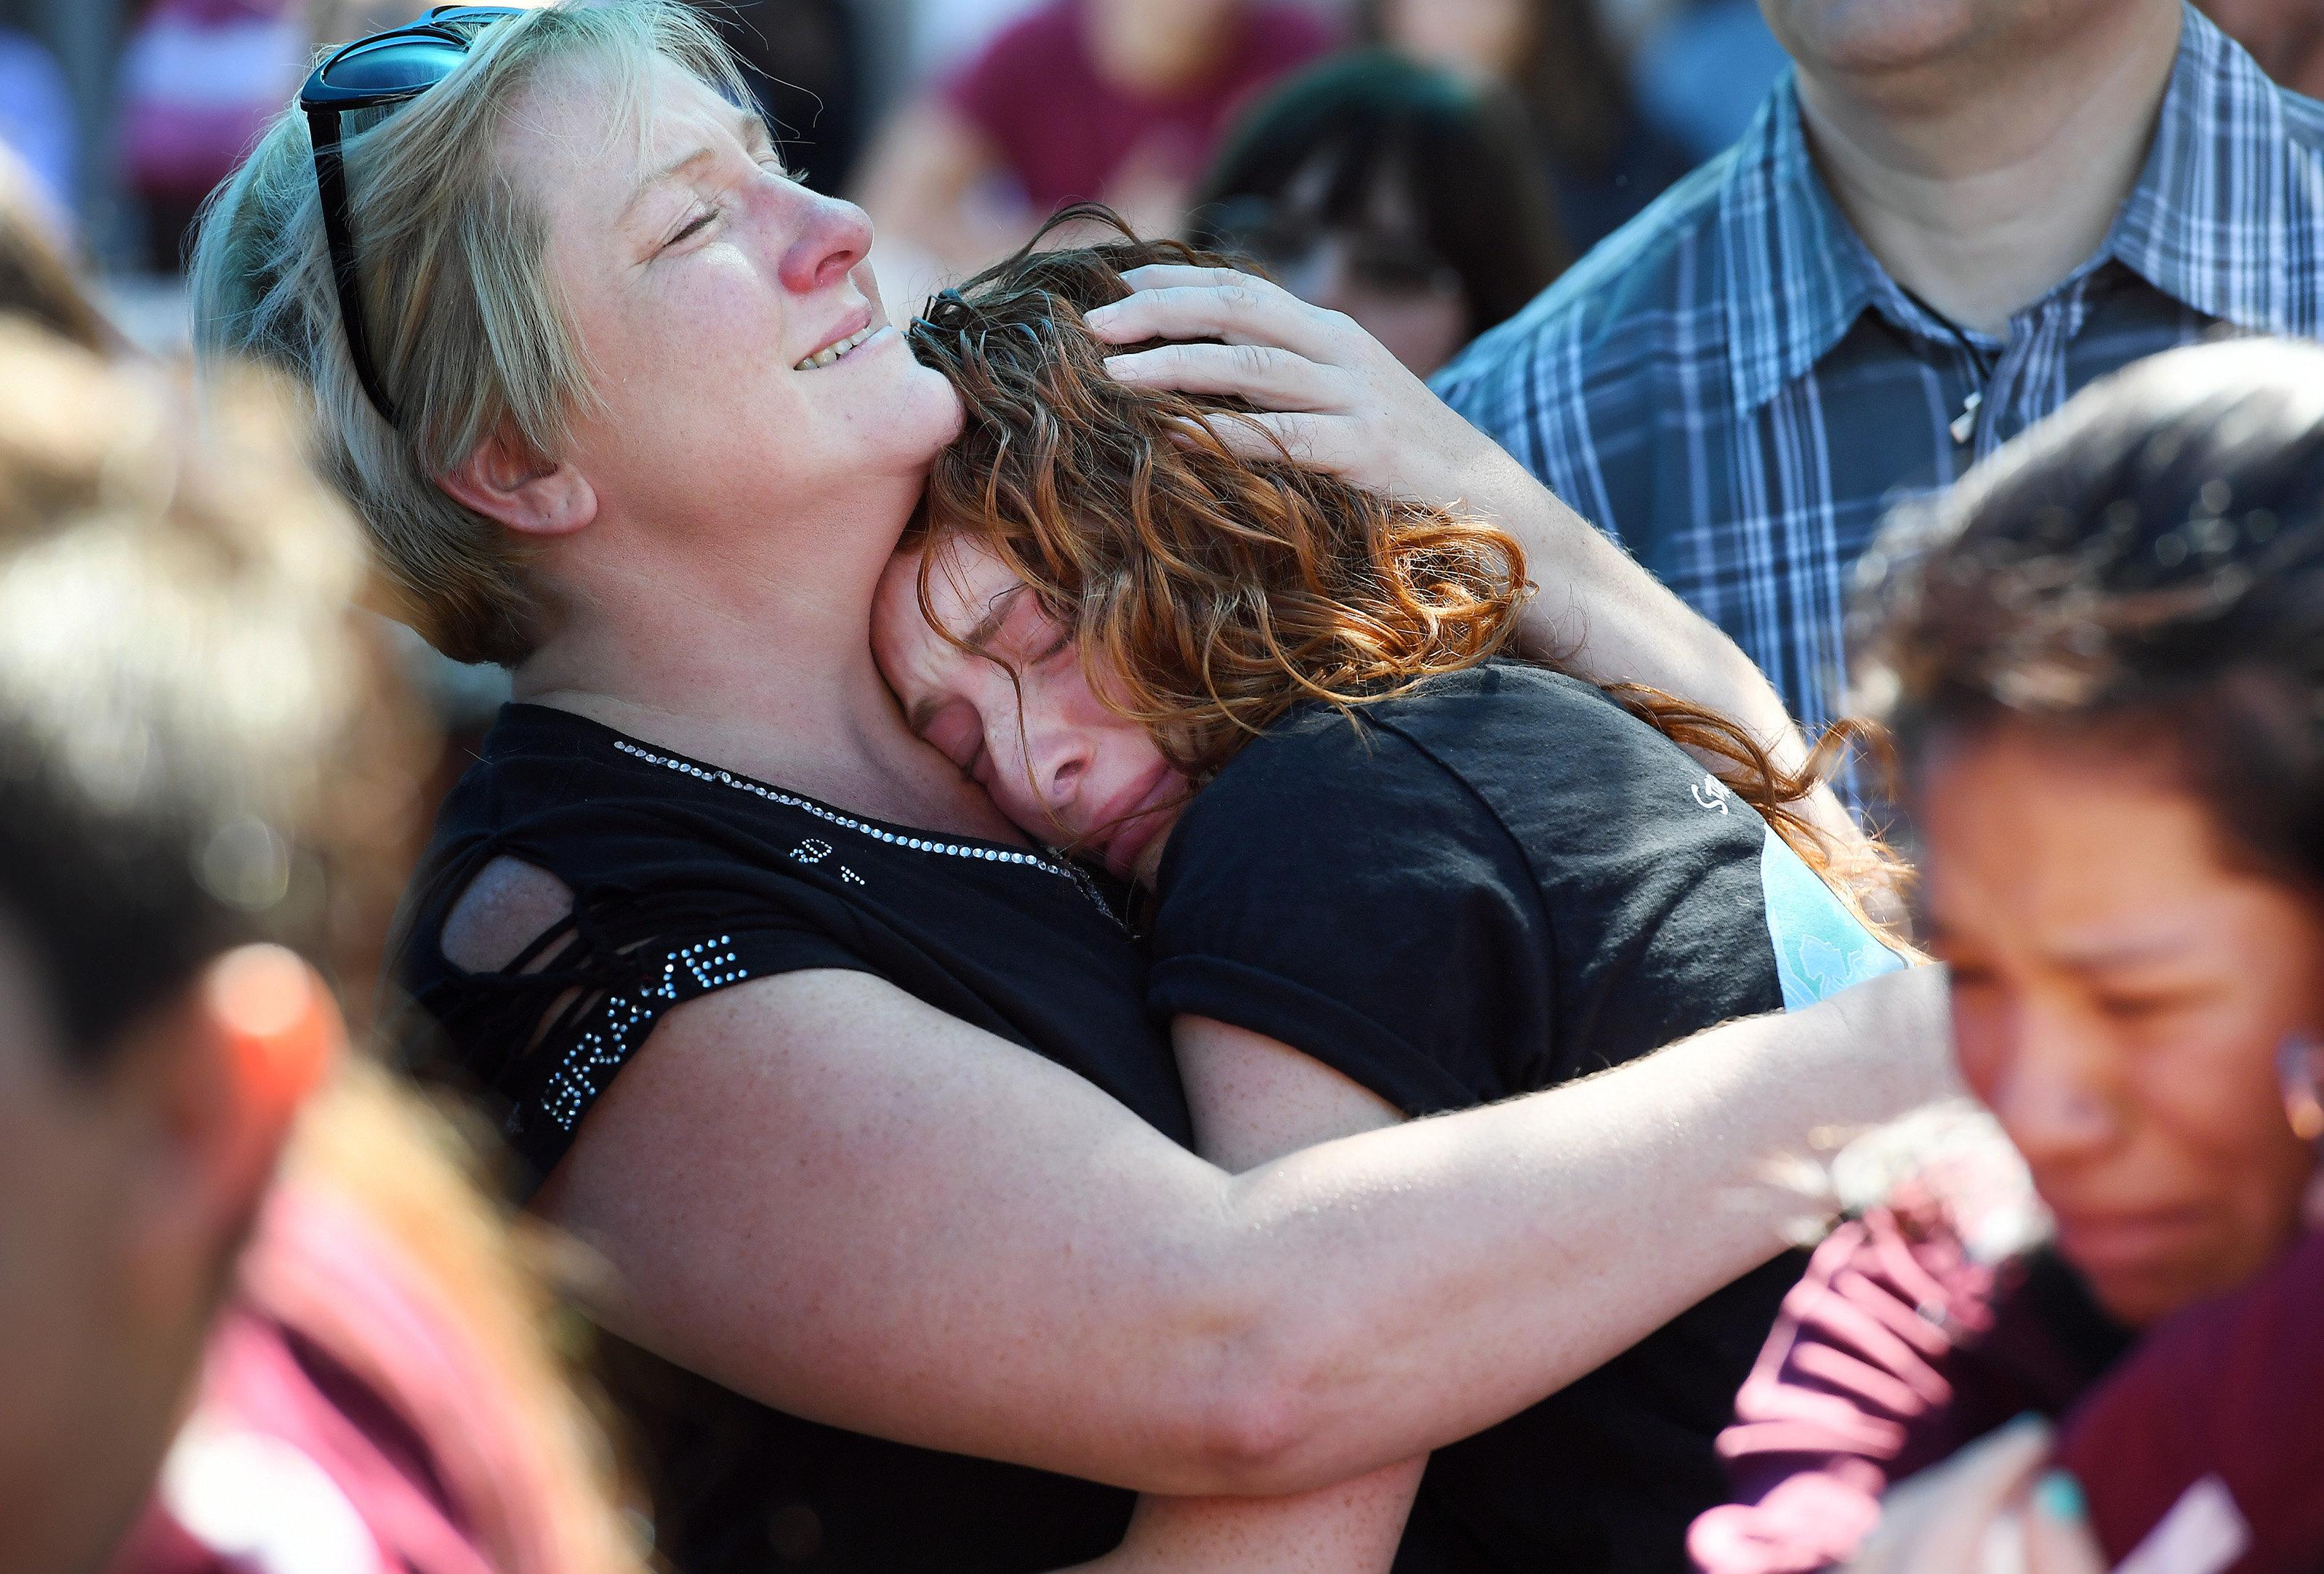 Tonya Kramer embraces her daughter, Alyssa, 16, during a community prayer vigil at Parkridge Church in Coral Springs, F